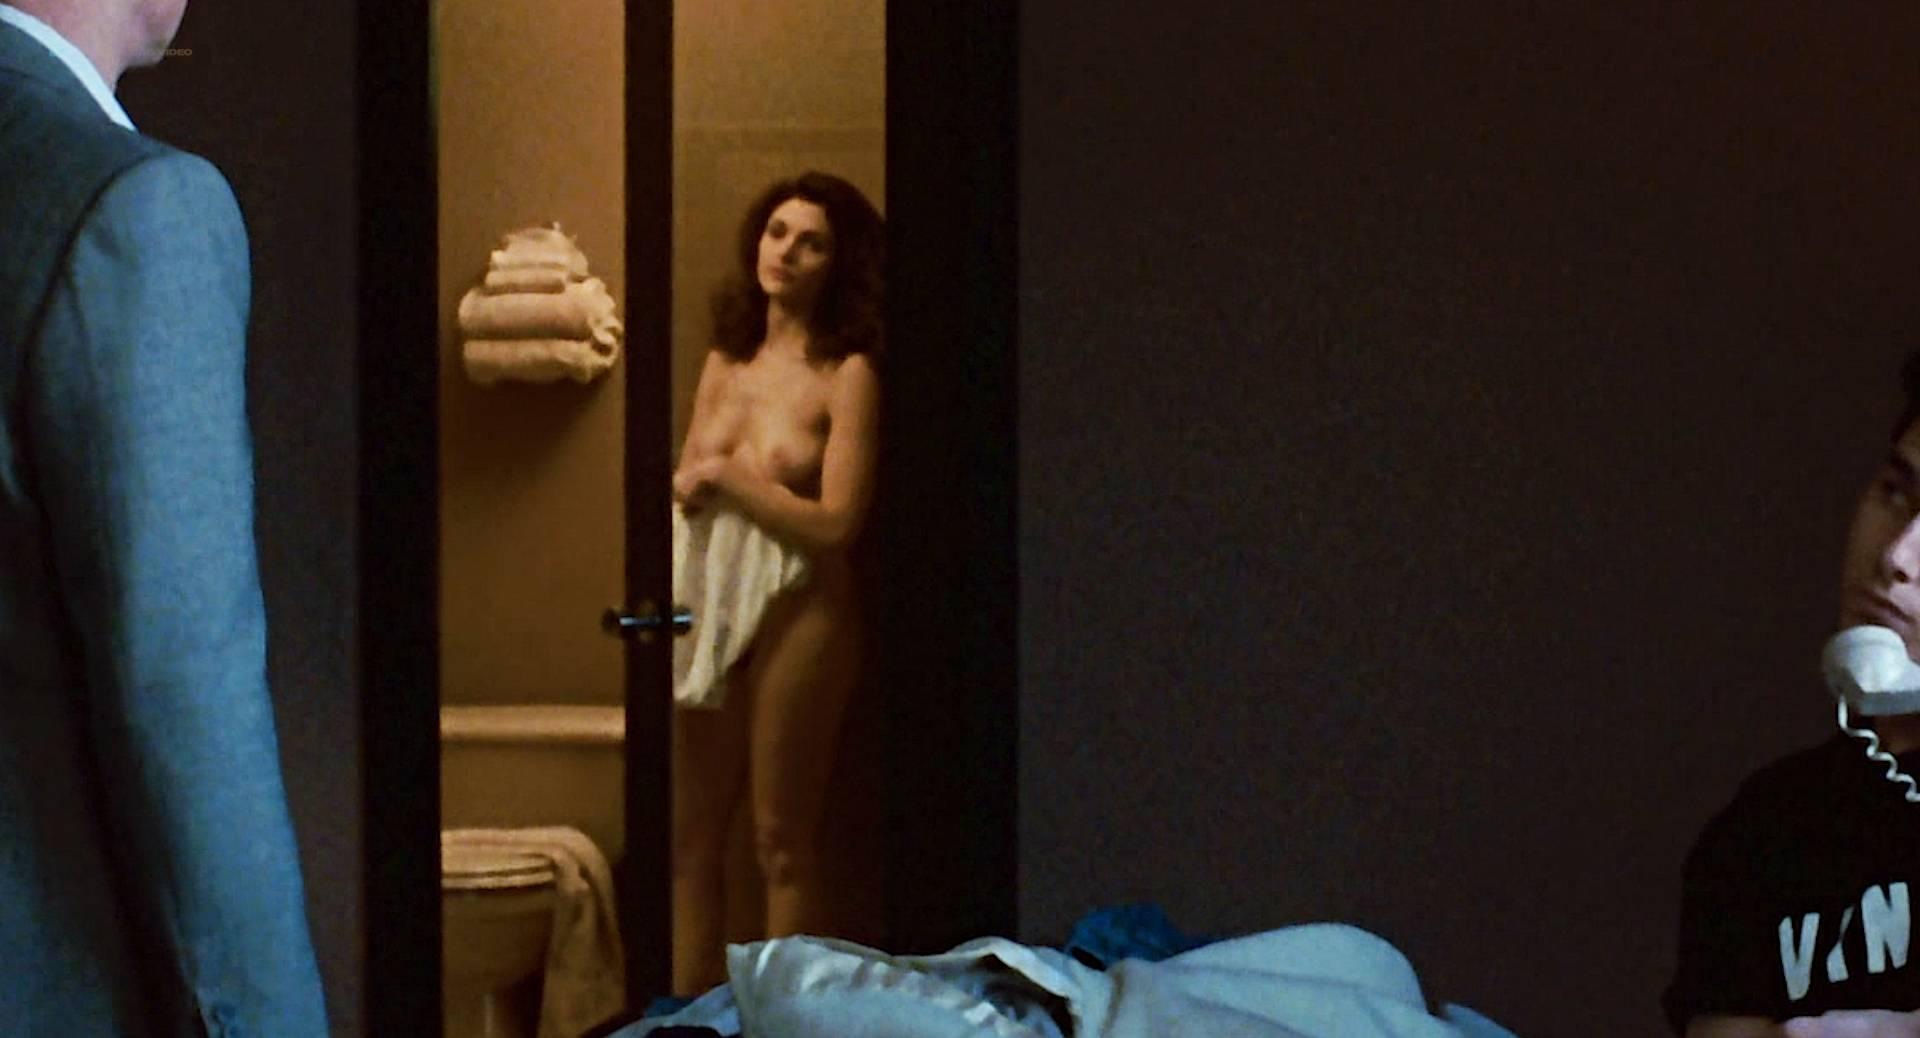 Girls china nude hot